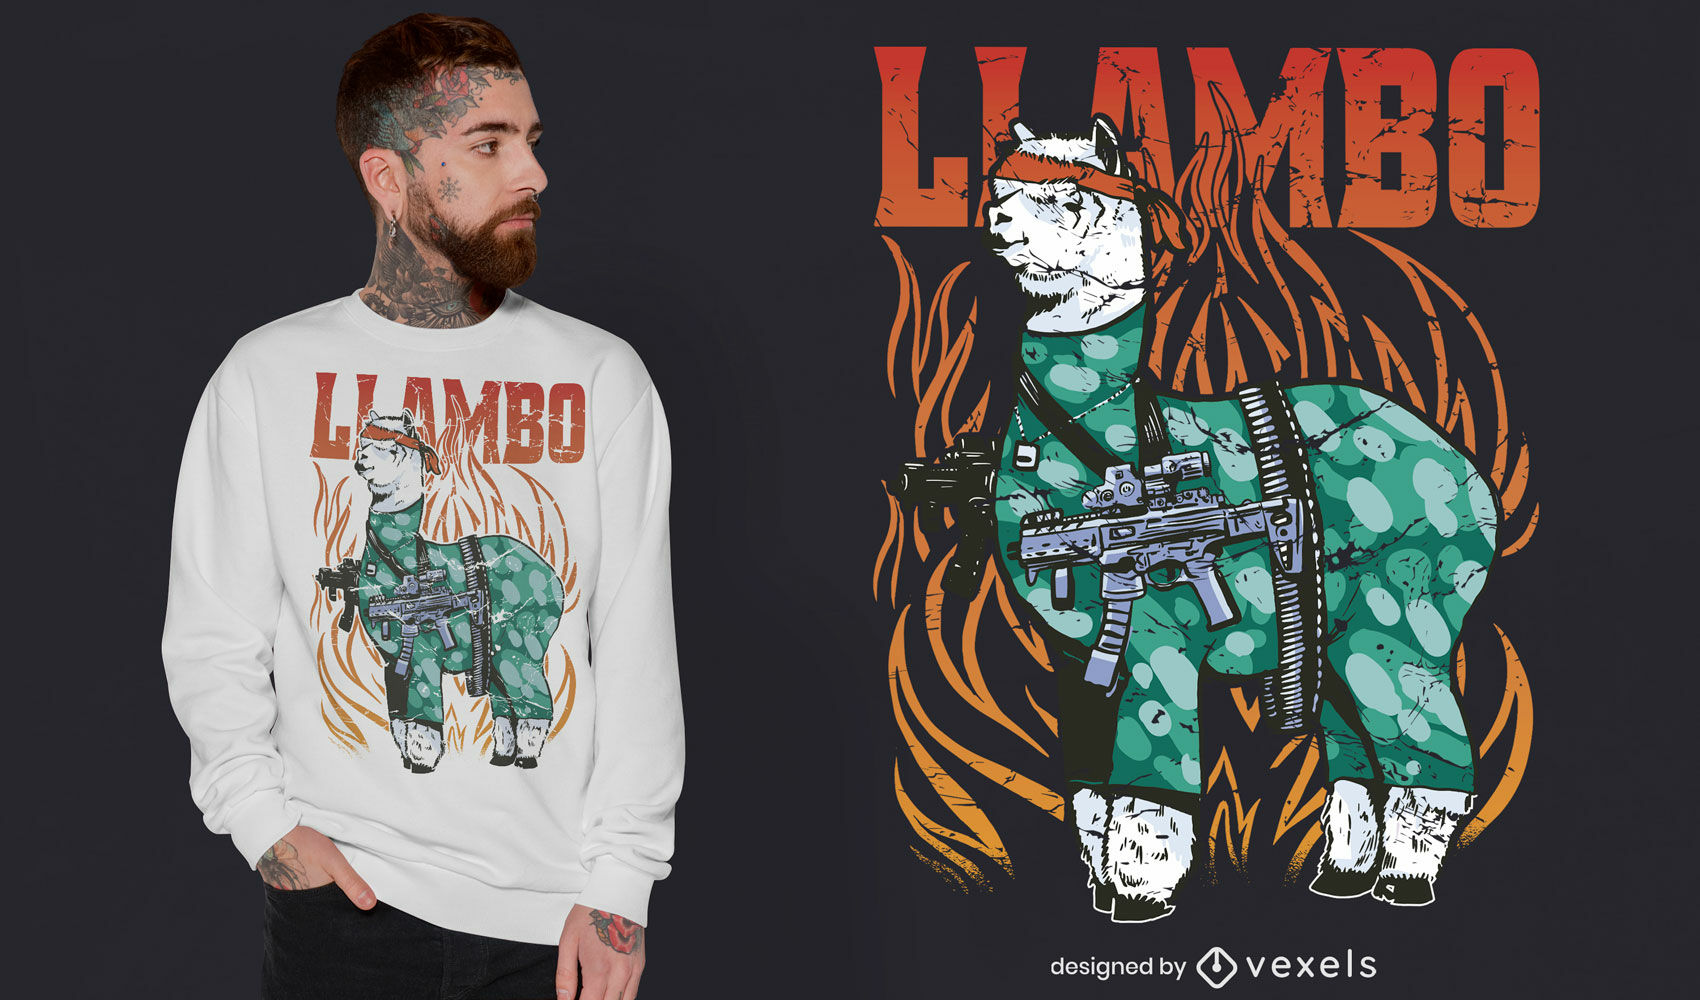 Dise?o de camiseta cool war llama